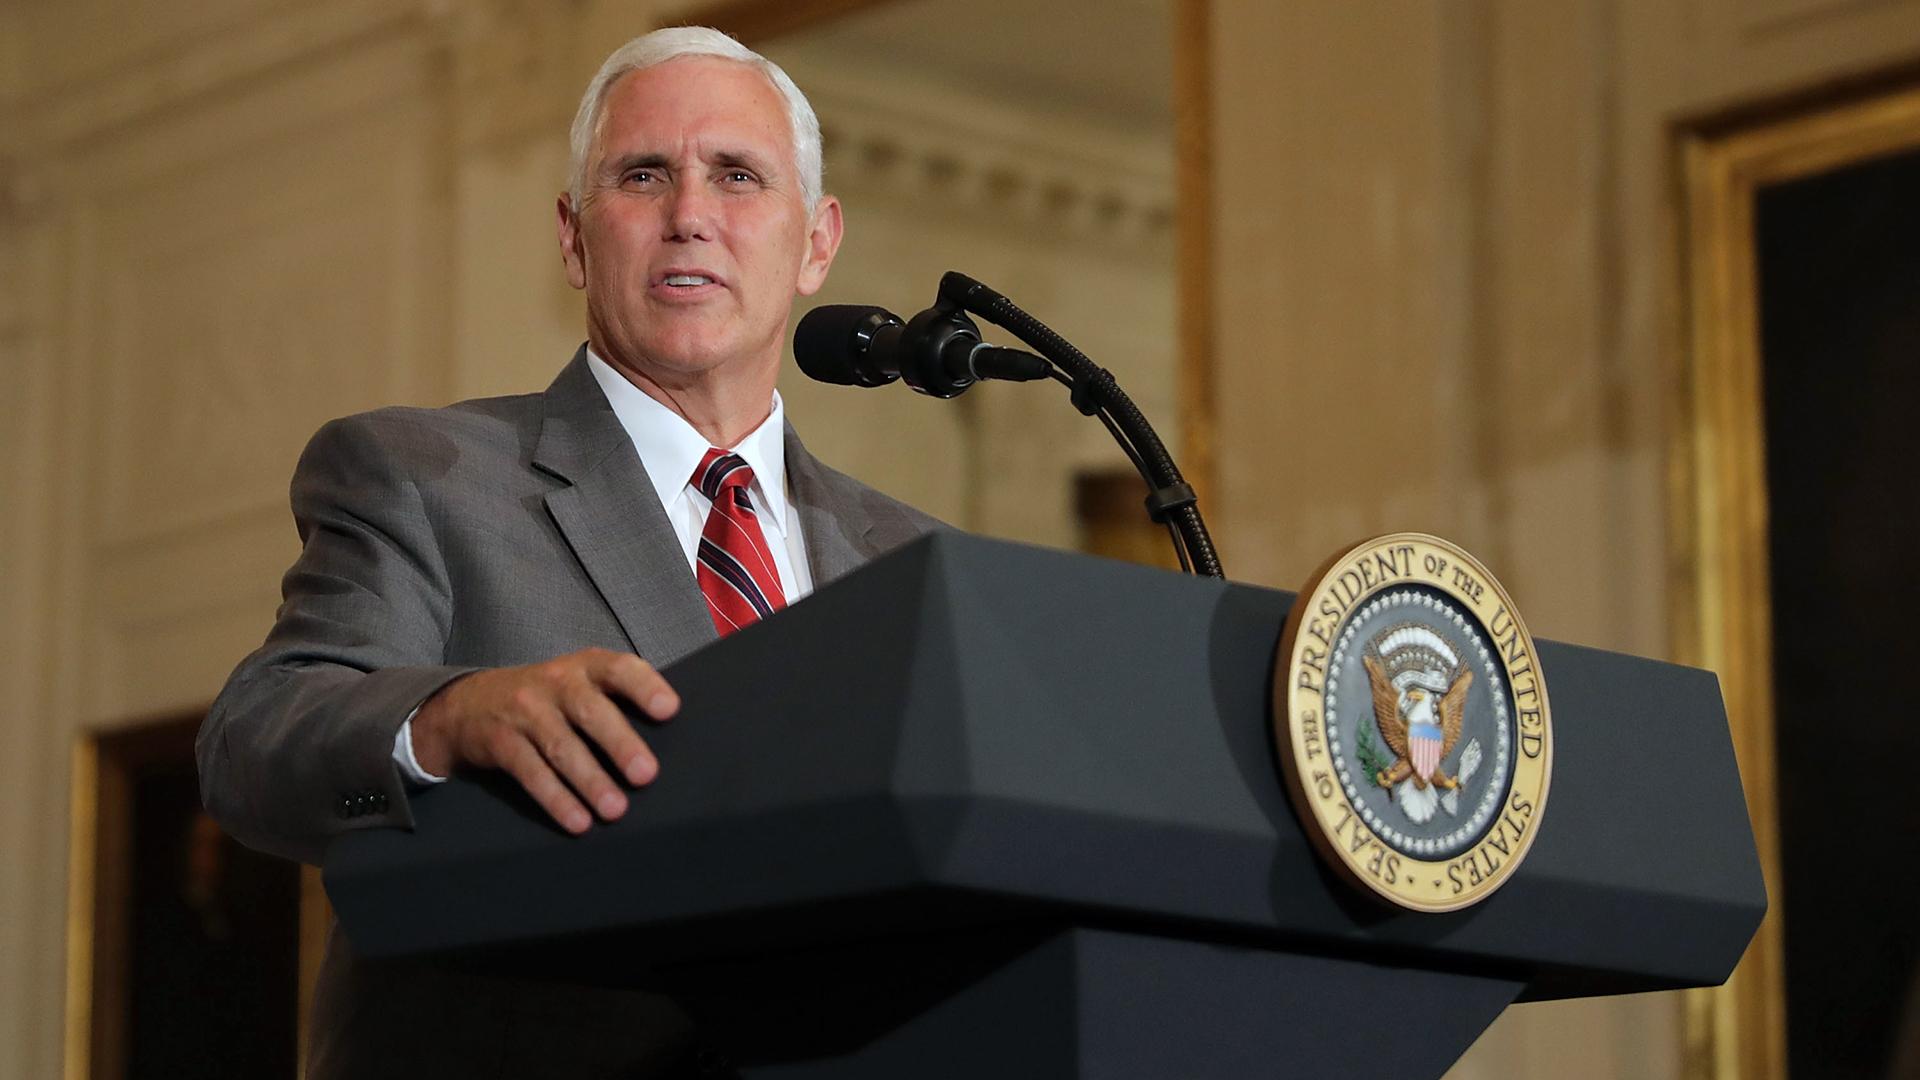 Mike Pence at White House podium-159532.jpg47907479